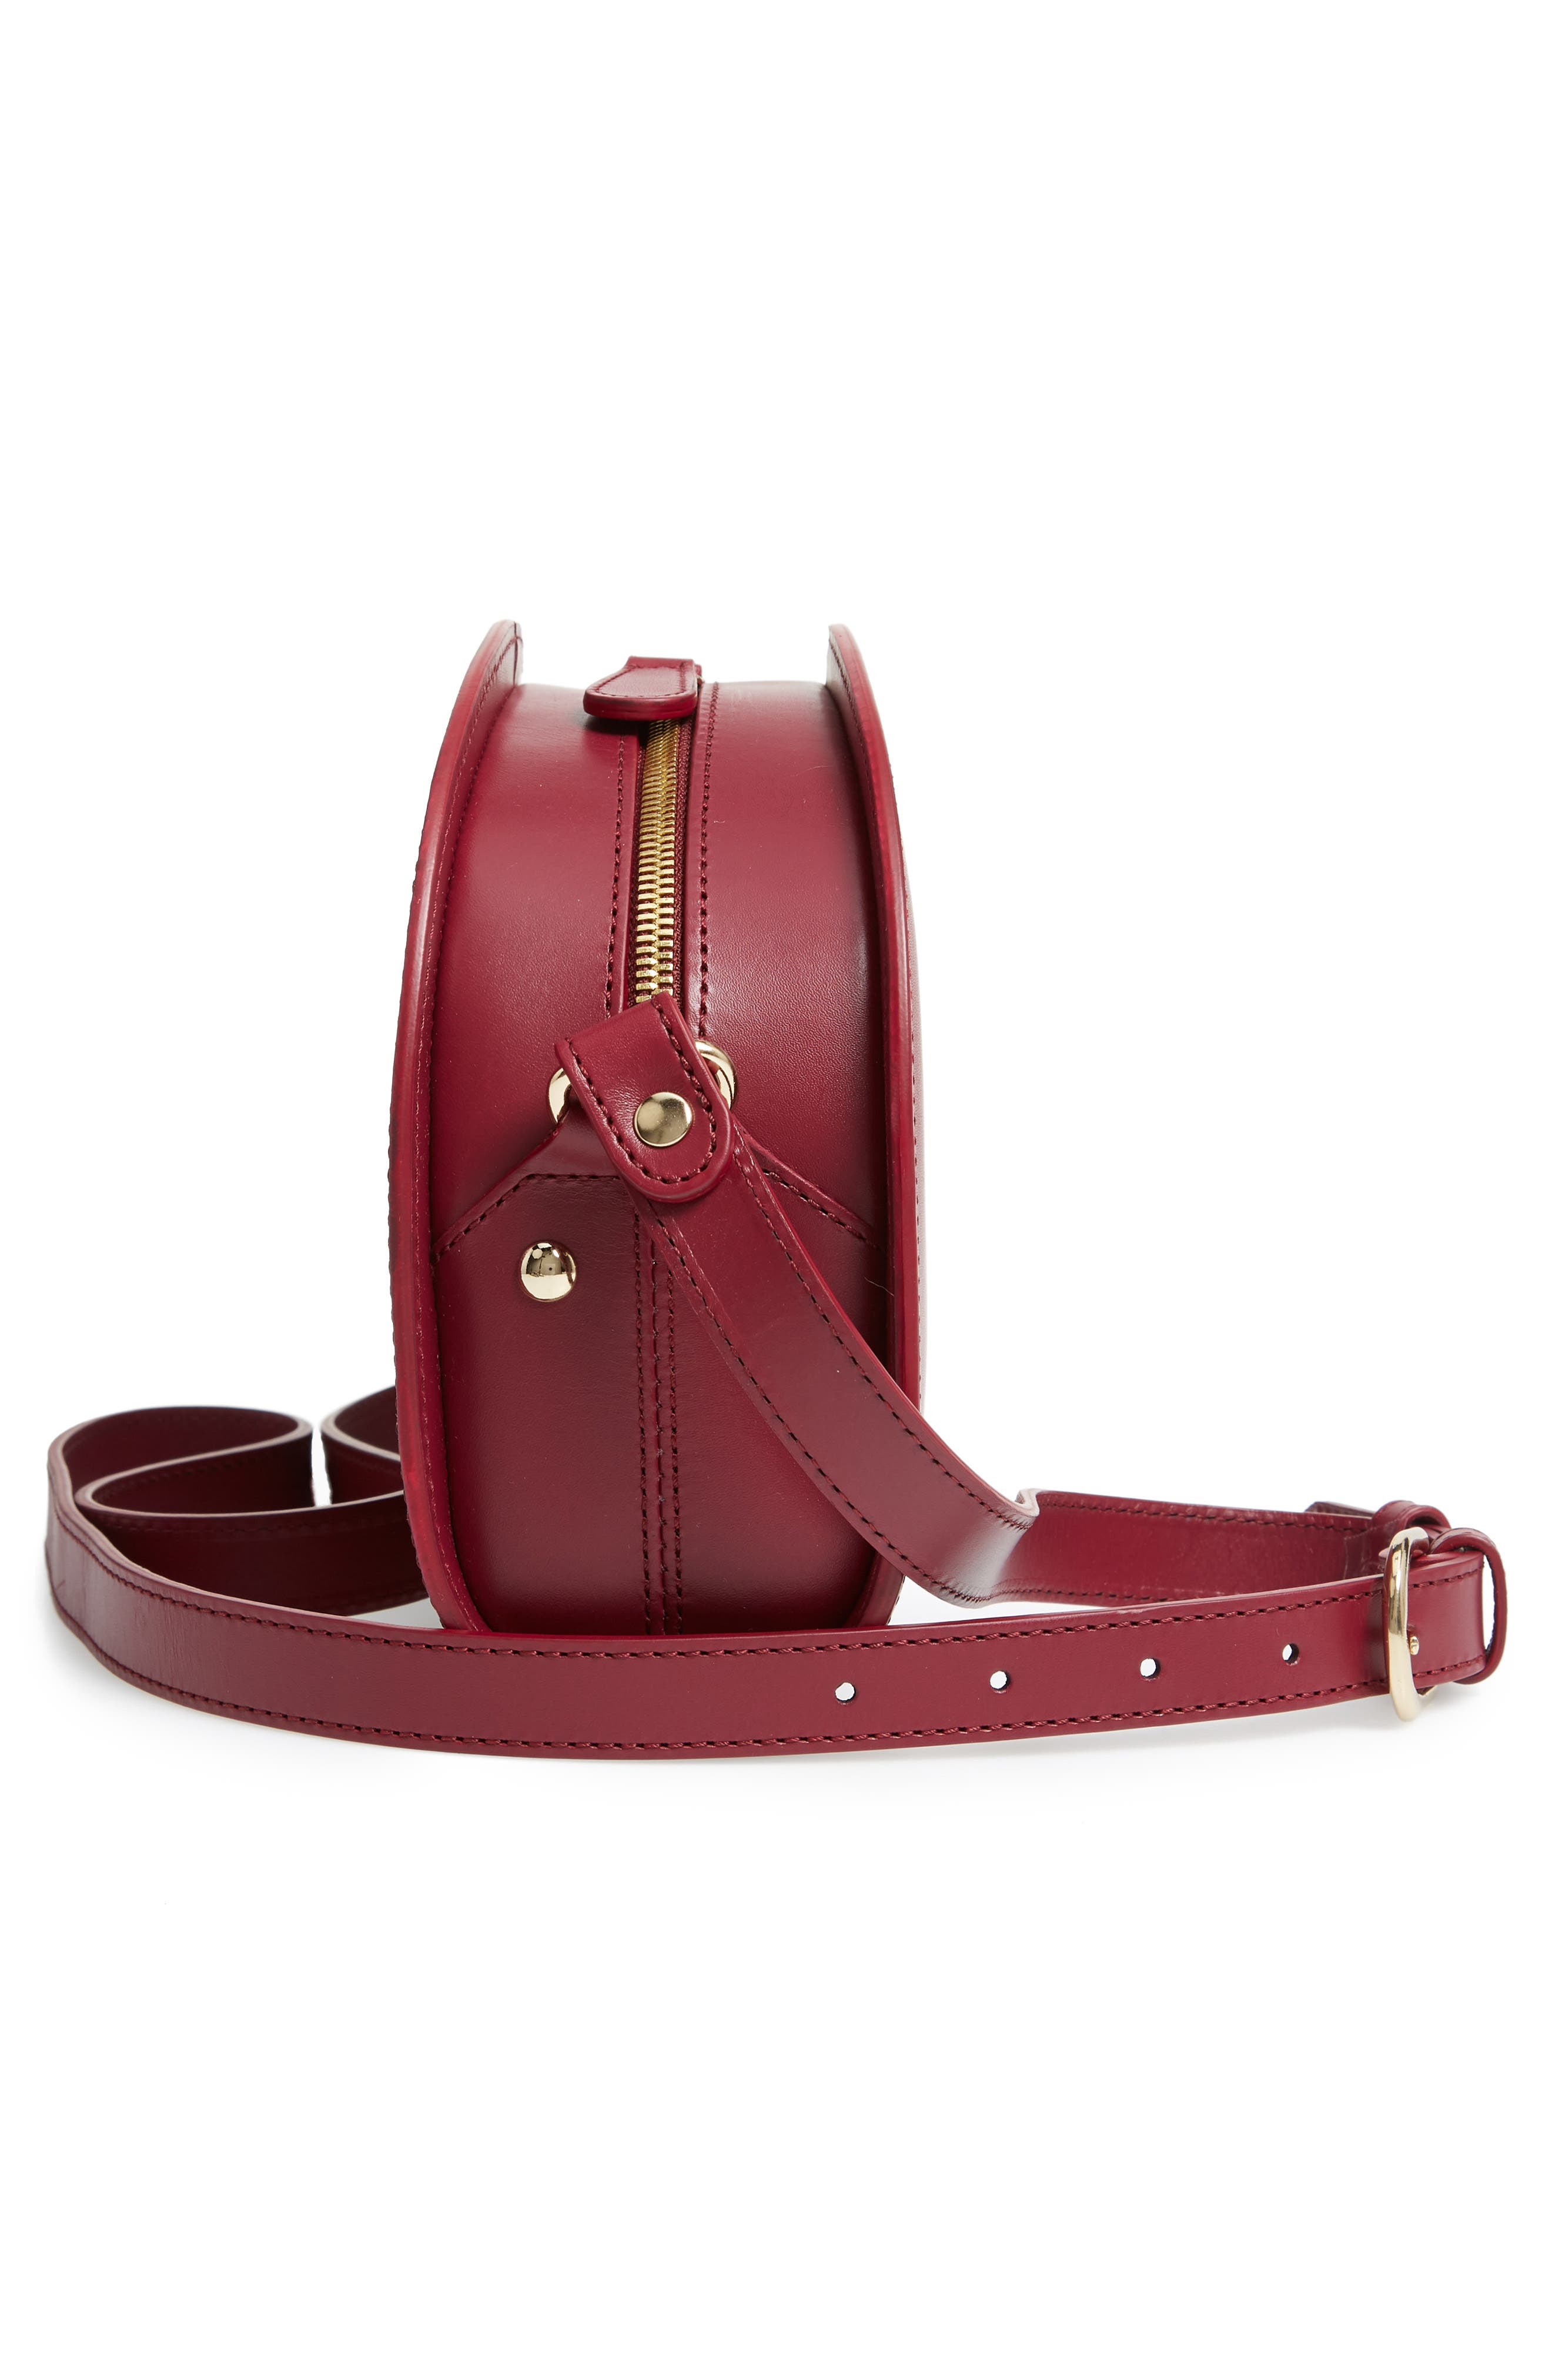 Sac Demi Lune Leather Crossbody Bag,                             Alternate thumbnail 5, color,                             FRAMBOISE